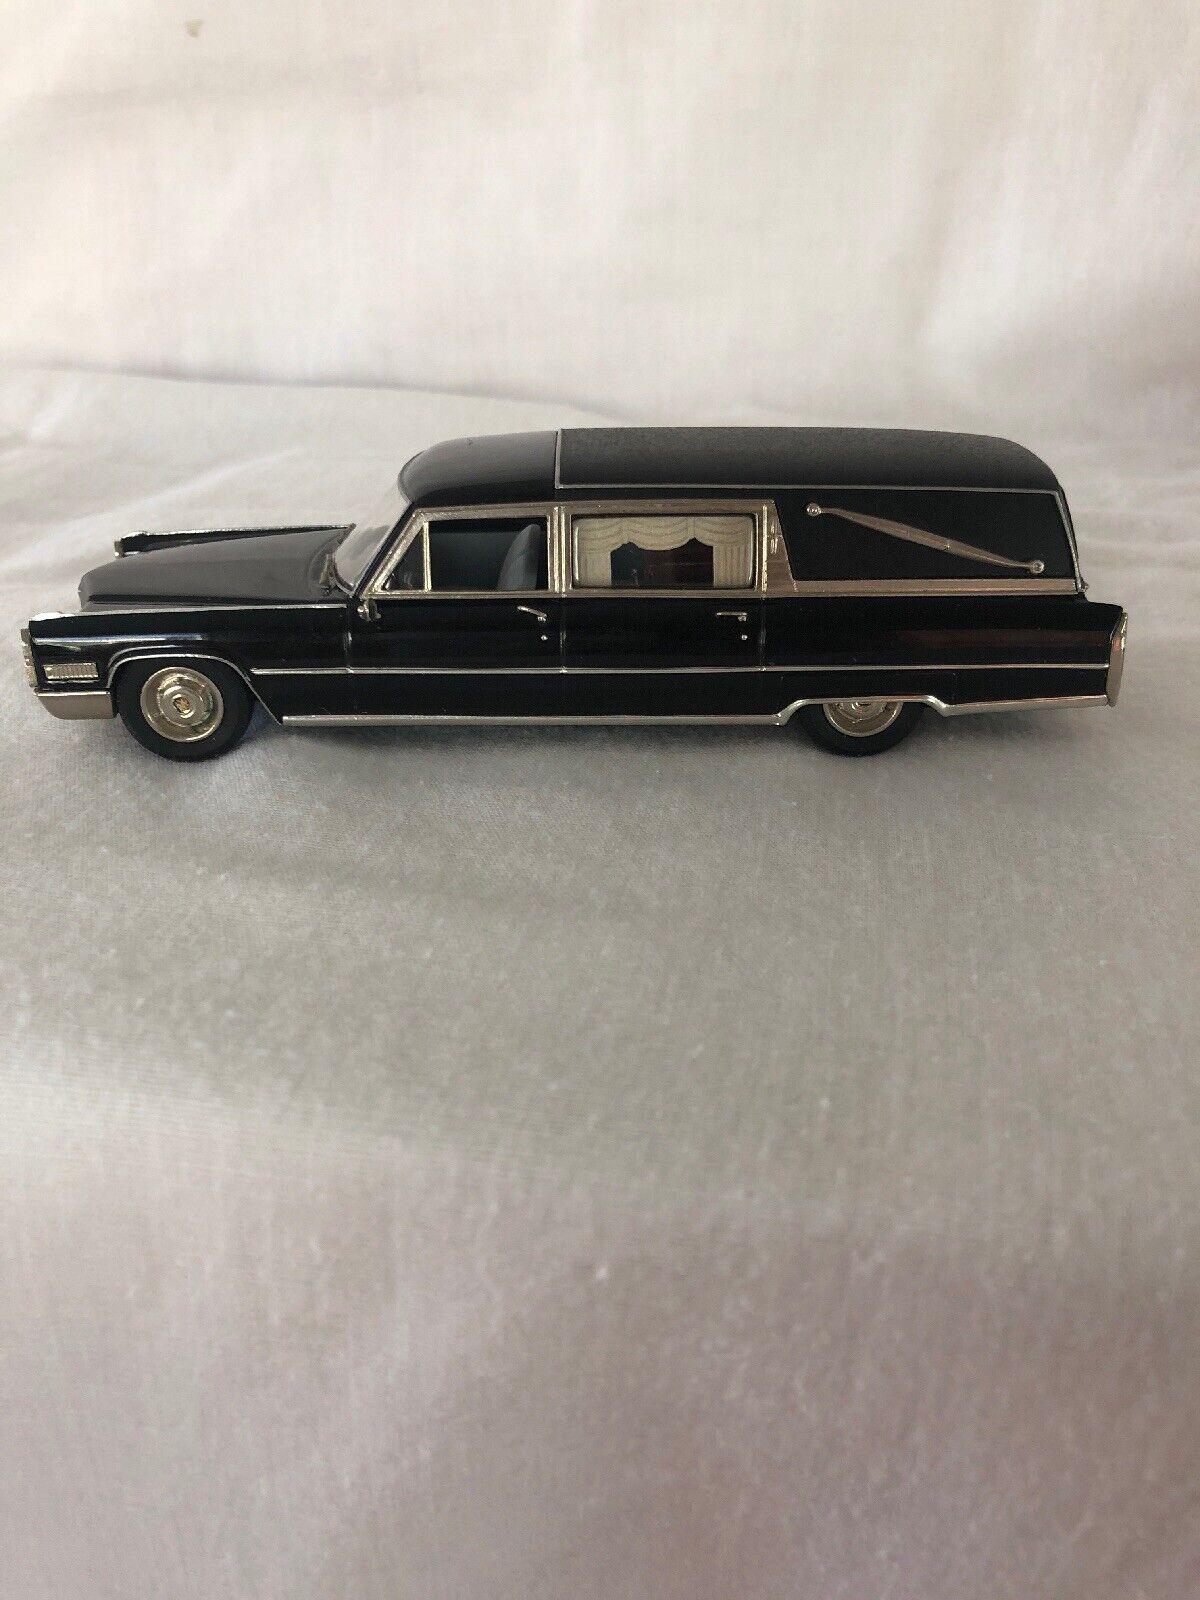 Sällsynta Motor City USA MC-79 1966 Cadillac Deluxe Hearse svkonst 1 43 Scale W  Box